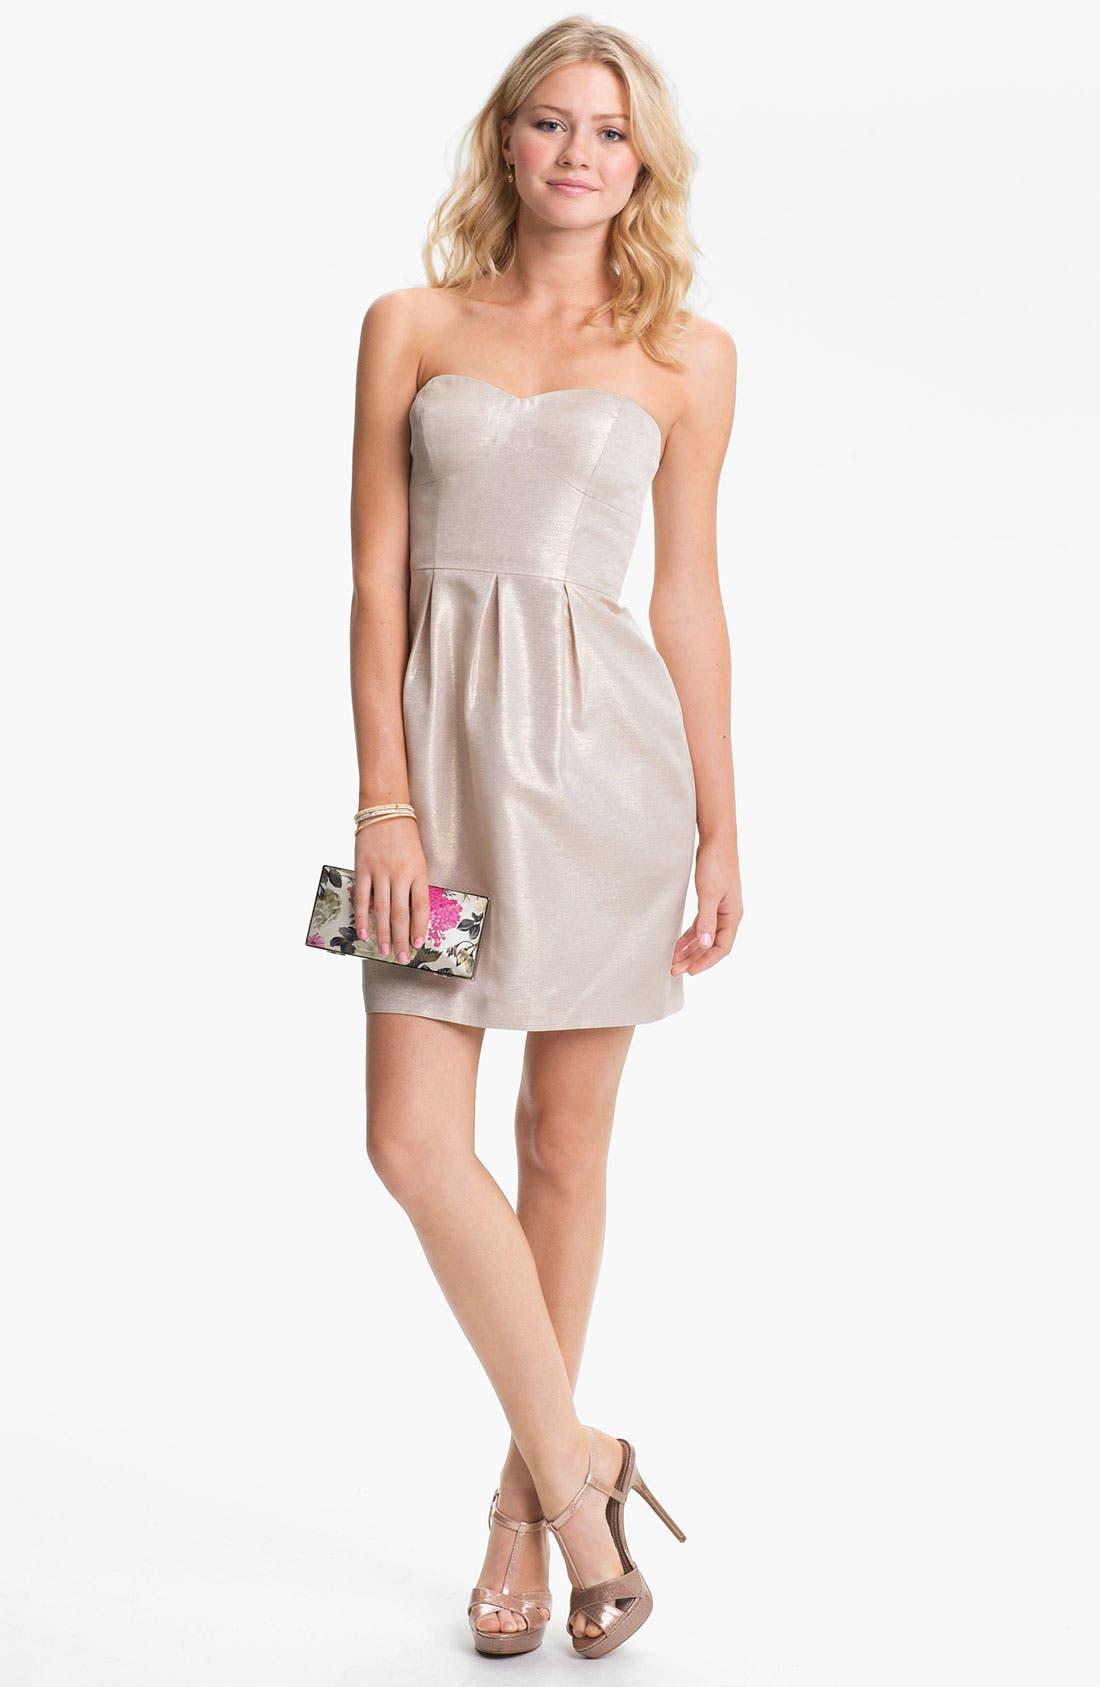 Alternate Image 1 Selected - Aidan Mattox Metallic Strapless Tulip Dress